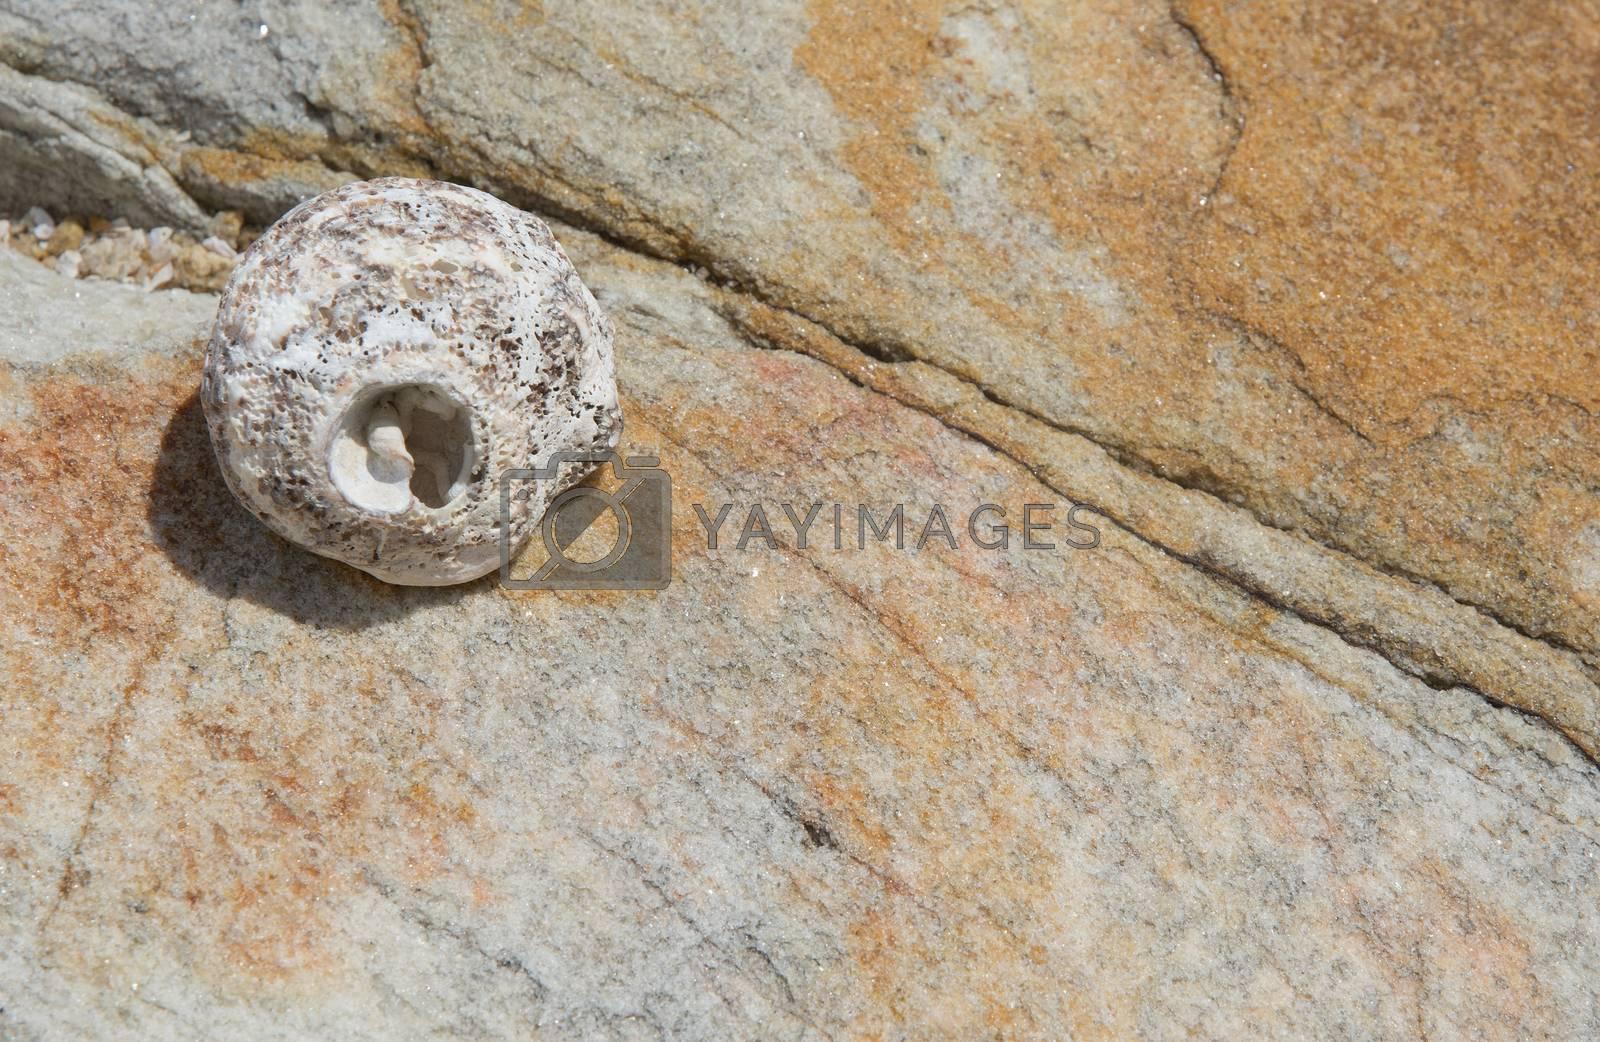 Seashell on rock background texture, Tangalle, Southern Province, Sri Lanka, Asia.